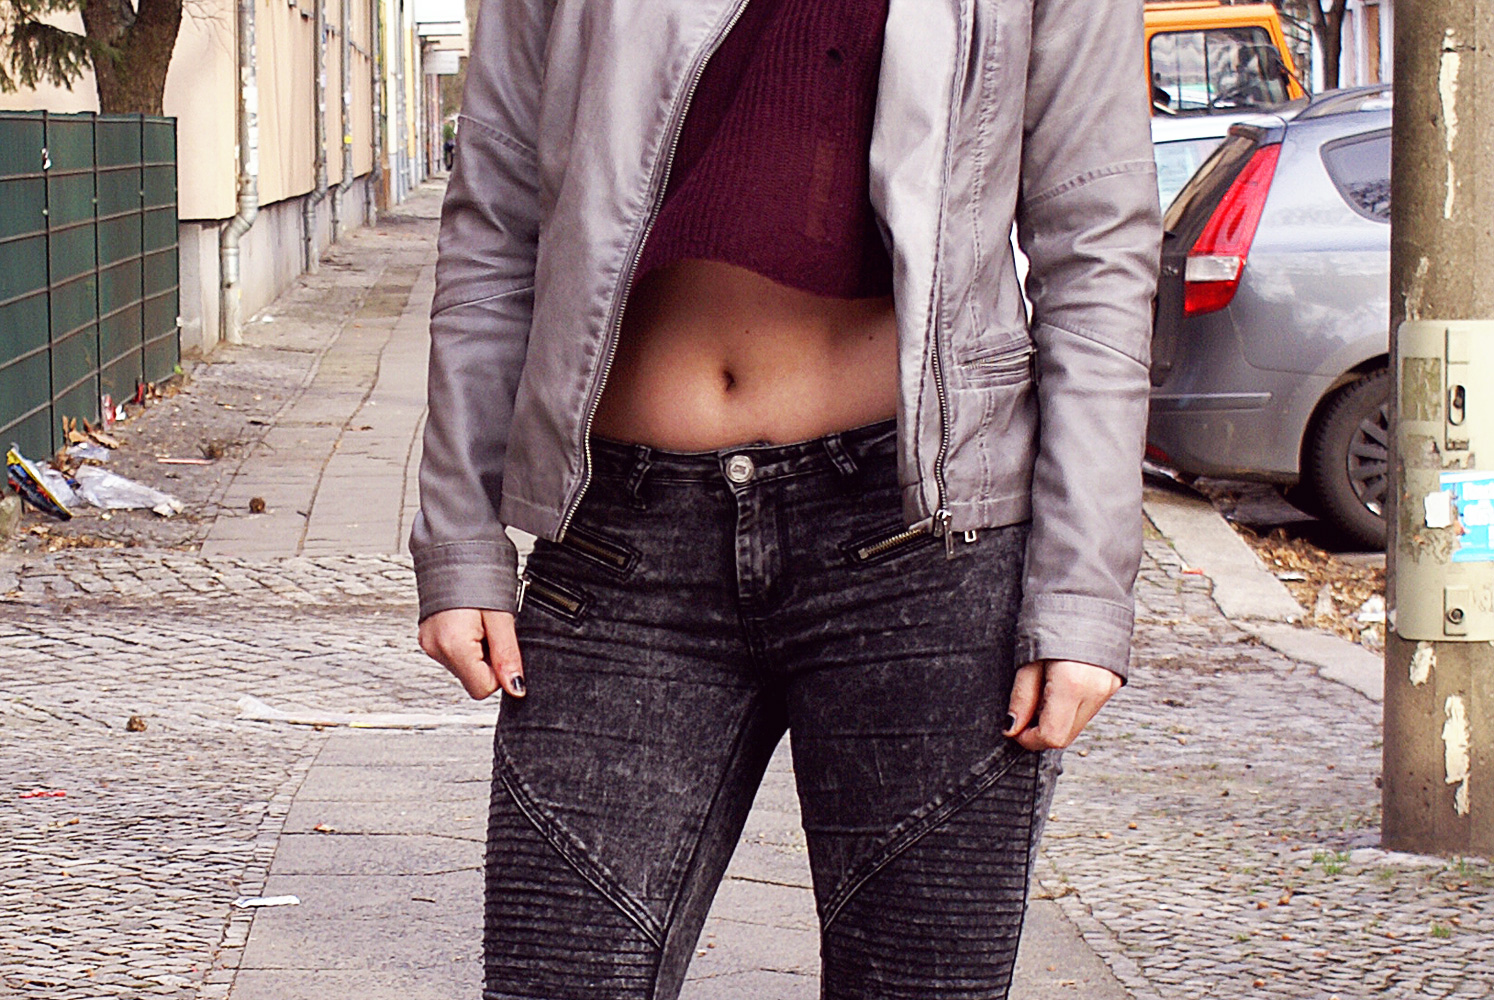 h&m, distressed, destroyed, pullover, puilli, divided, marsala, wine, weinrot, grau, lederjacke, moto jeans, biker, jeans, street super shoes, sacha, boots, schnallen, punk, grunge, grungy, skulls, crop, alternative, altfashion, outfit, h&m, distressed, destroyed, pullover, puilli, divided, marsala, wine, weinrot, grau, lederjacke, moto jeans, biker, jeans, street super shoes, sacha, boots, schnallen, punk, grunge, grungy, skulls, crop